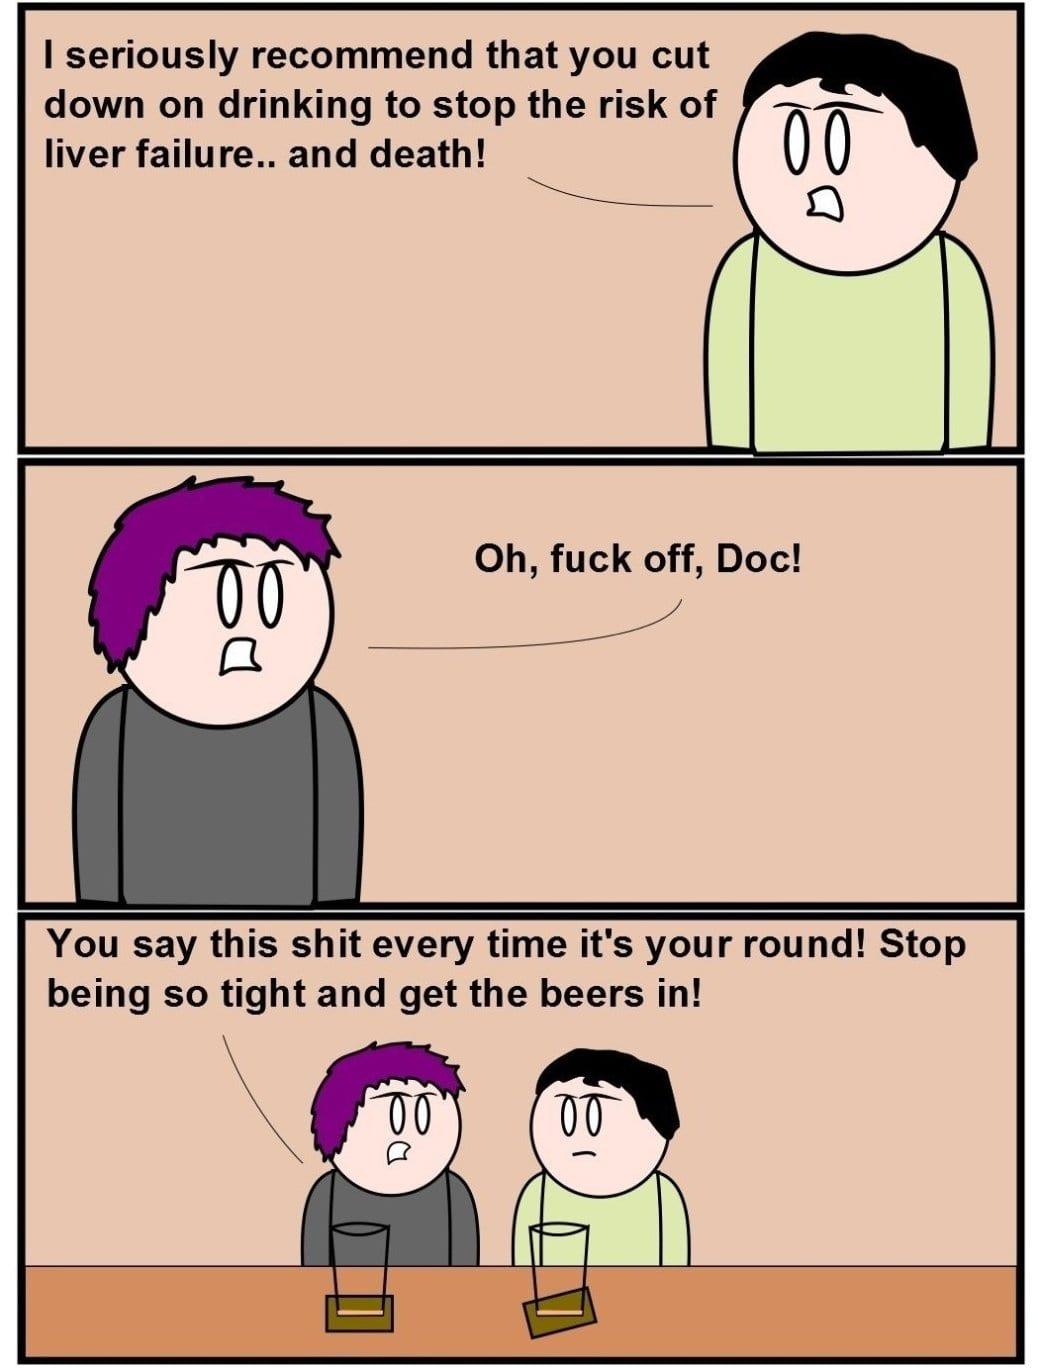 Funny Meme Pictures 2014 : Funny lol meme sparky doodles alcohol